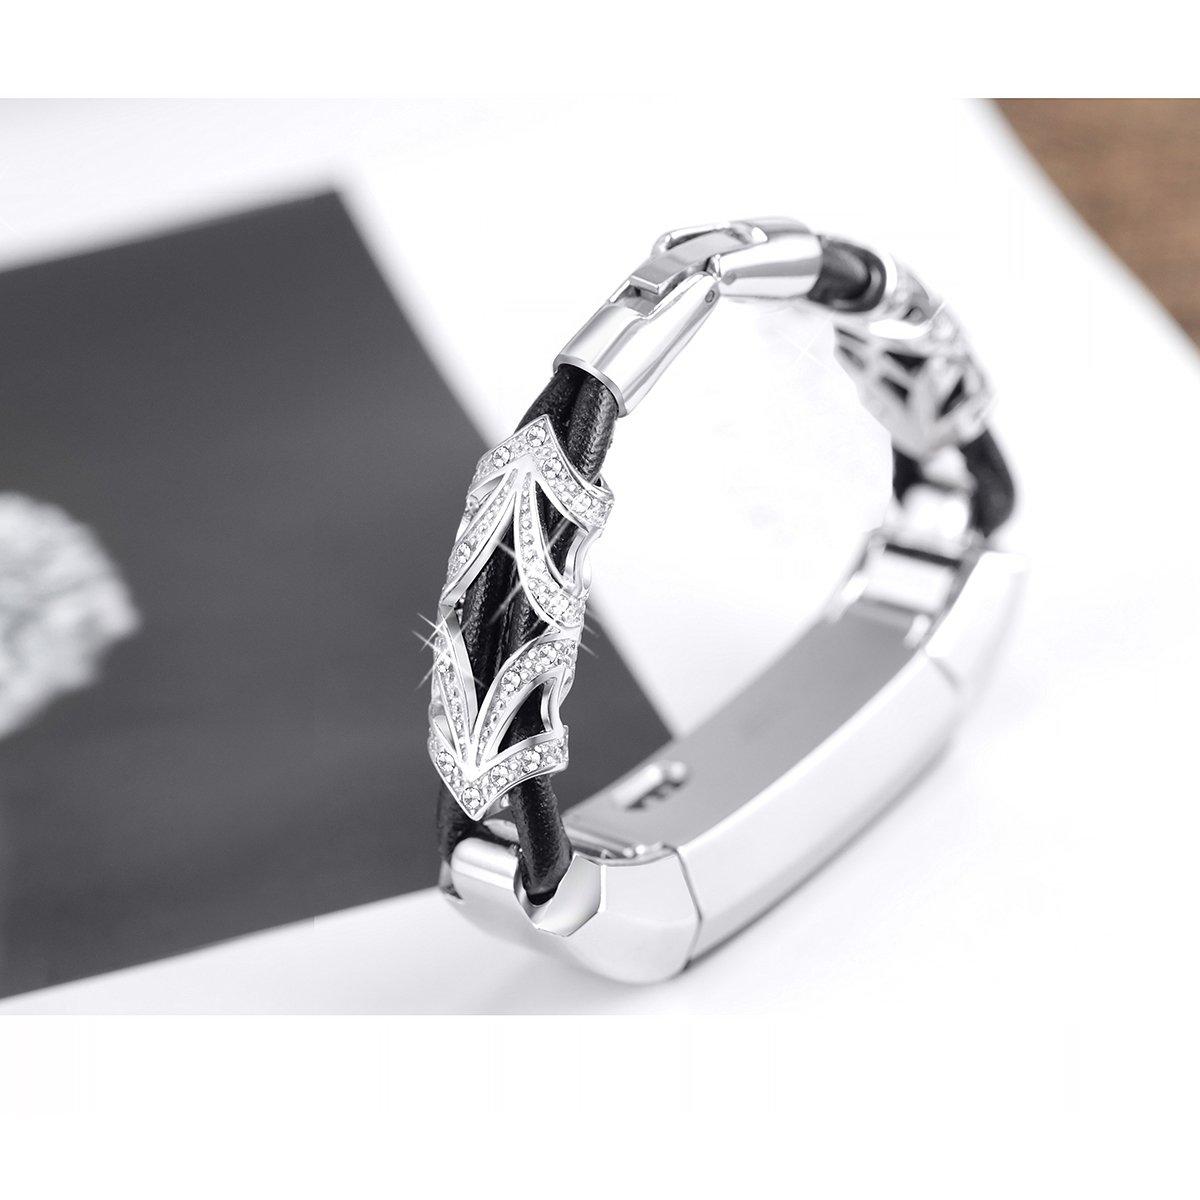 bayite Slim Leather Strap Cord Straps Wristband For Fitbit Alta /& Fitbit Alta HR